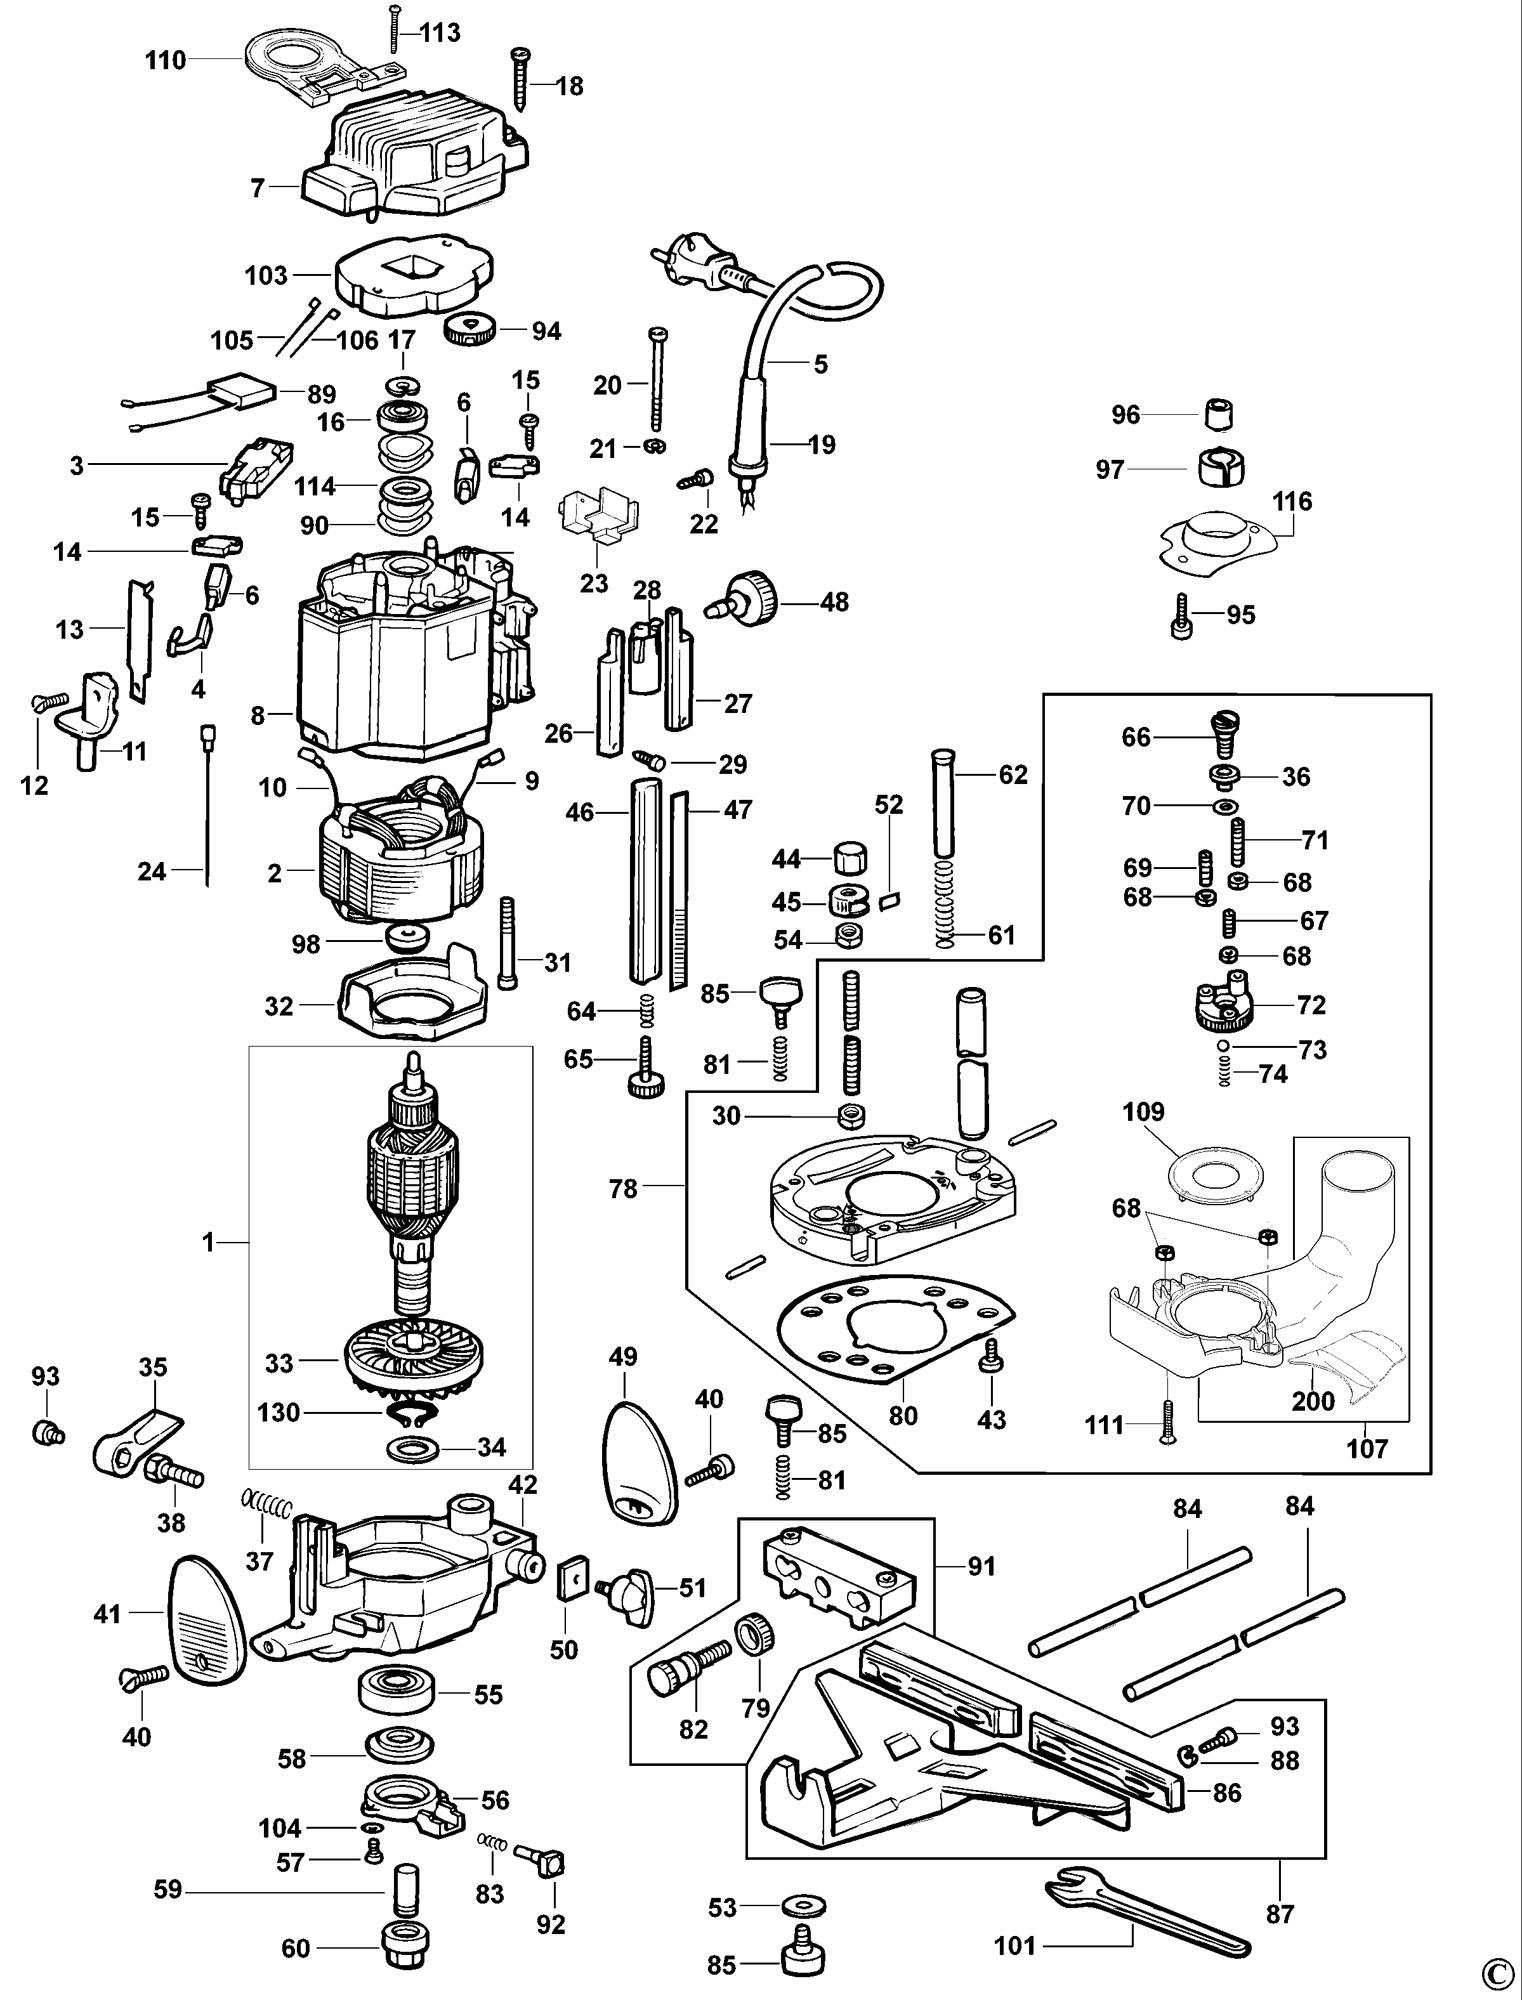 Spares For Dewalt Dw625e Router Type 5 Spare Dw625e Type